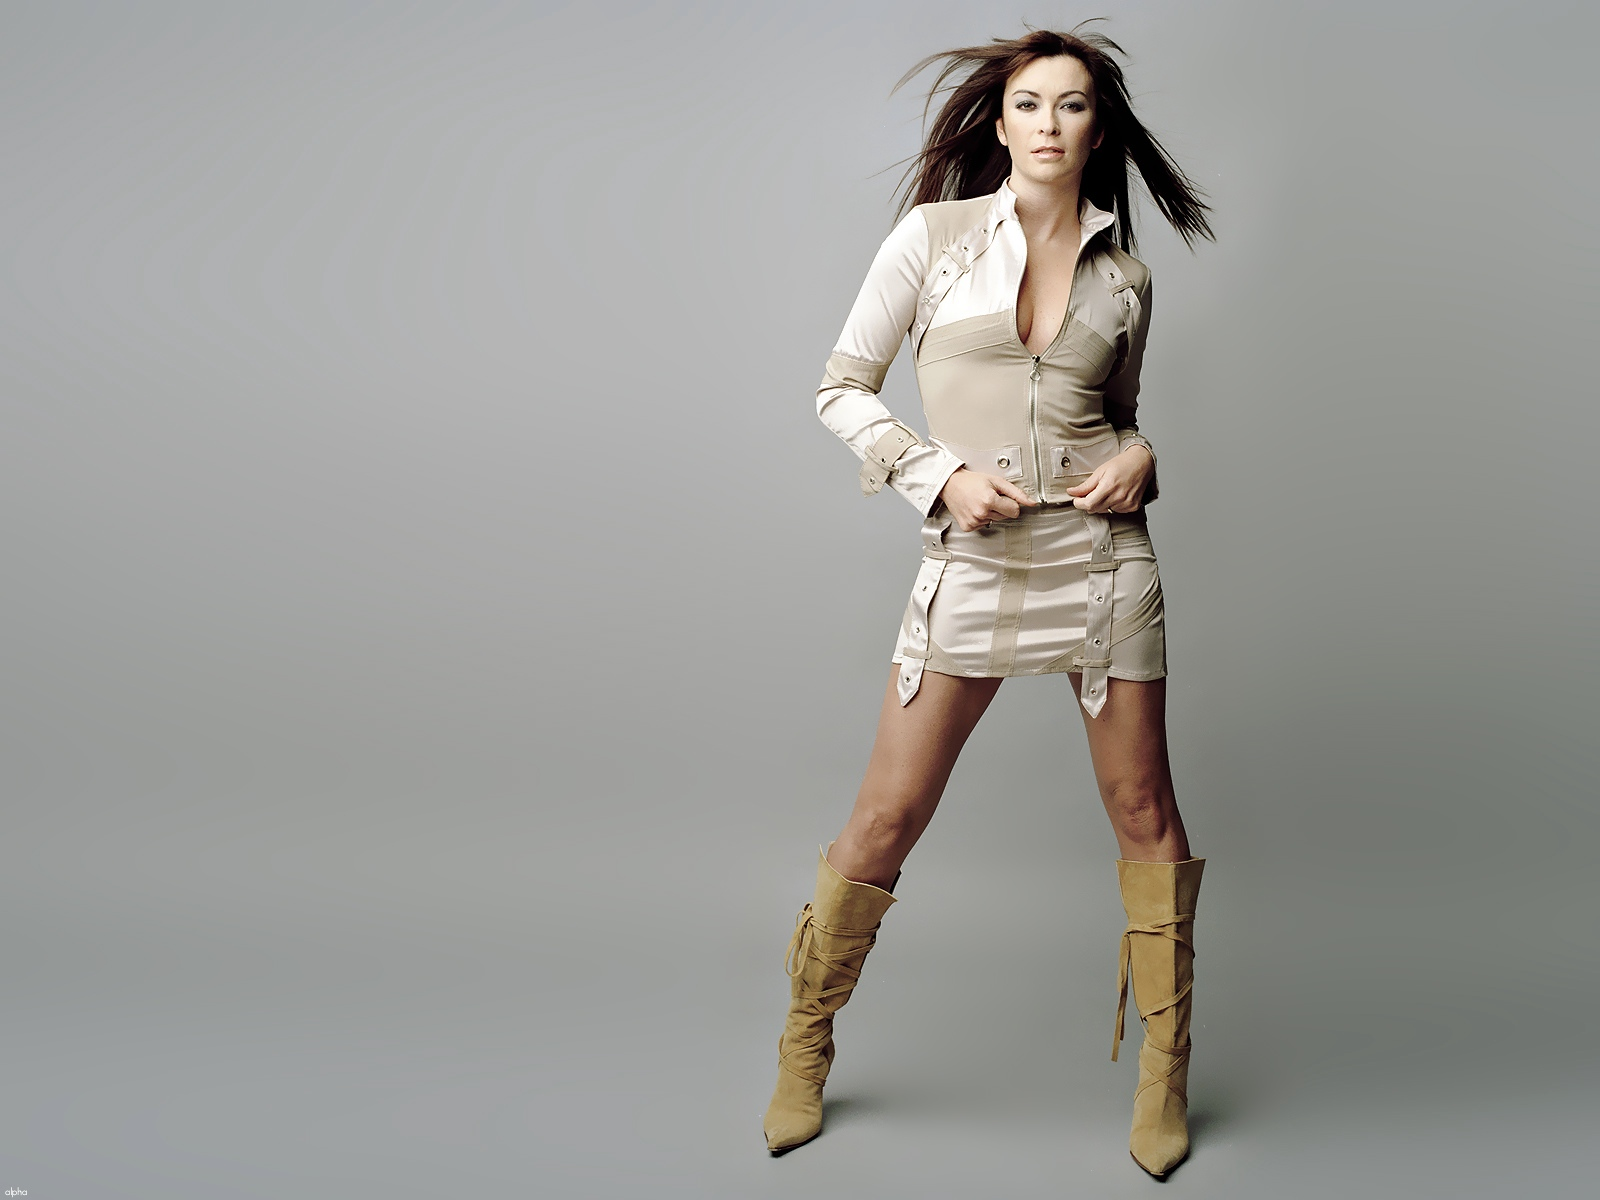 Nude glamour model portfolio